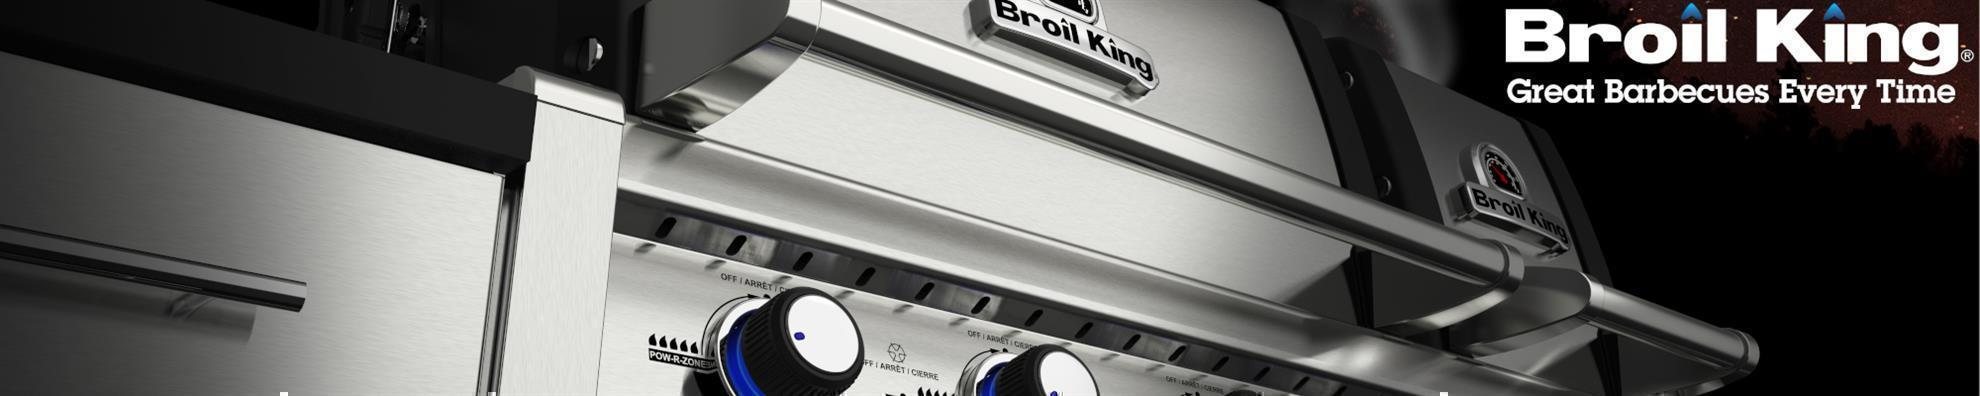 Broil King - SCHUTZHÜLLE MONARCH™ 300er SERIE, ROYAL™ 300er SERIE, BARON™ 300er SERIE